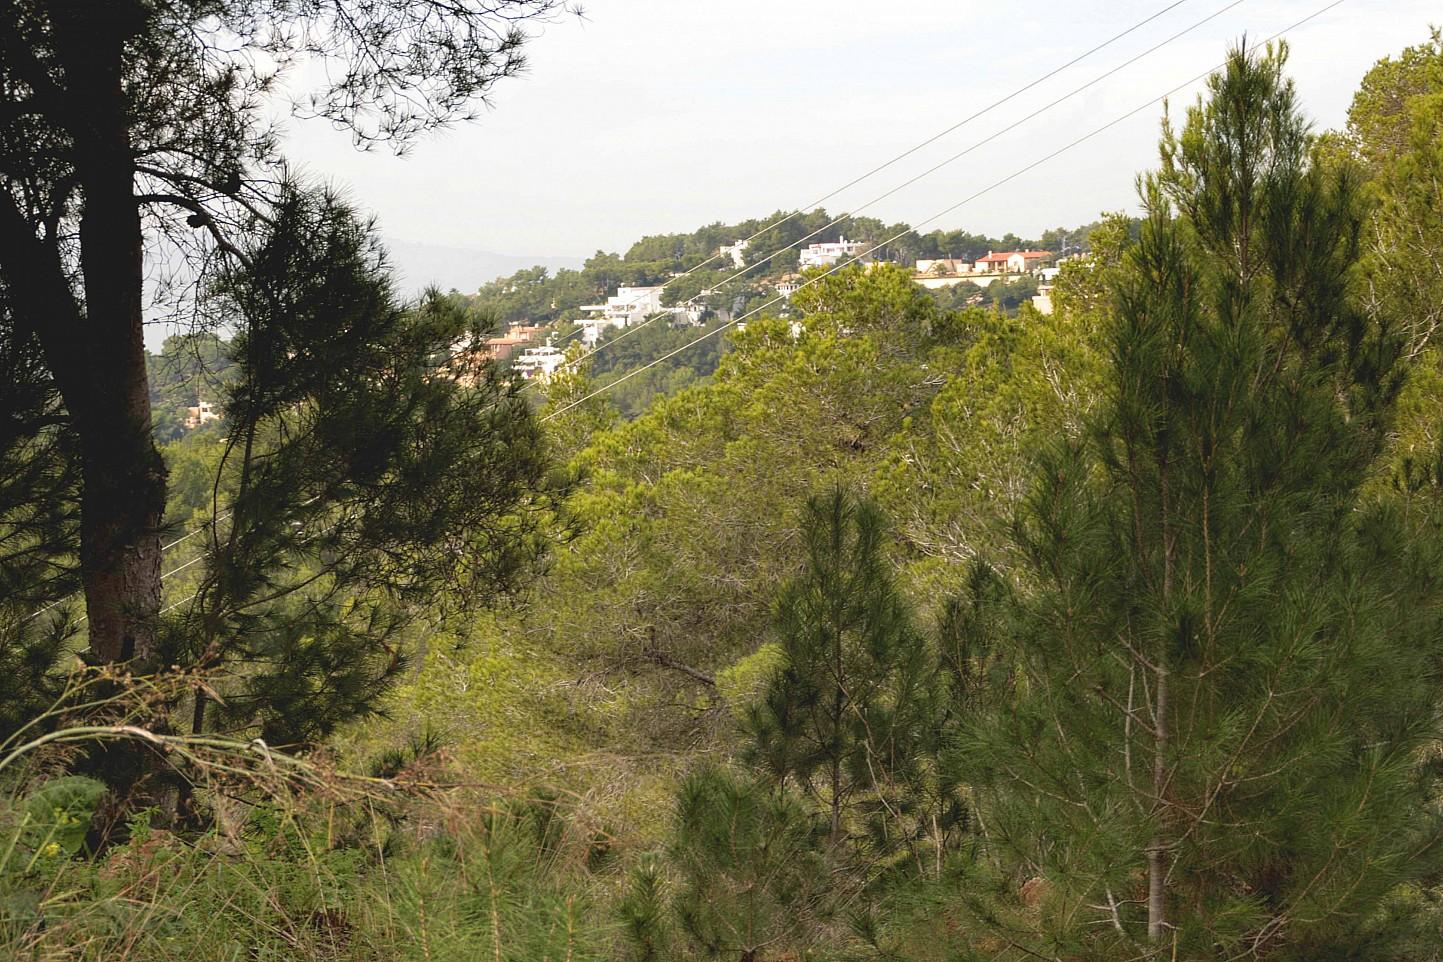 Terreny urbanitzable en venda de 55.000 m2 a Can Furnet, Eivissa